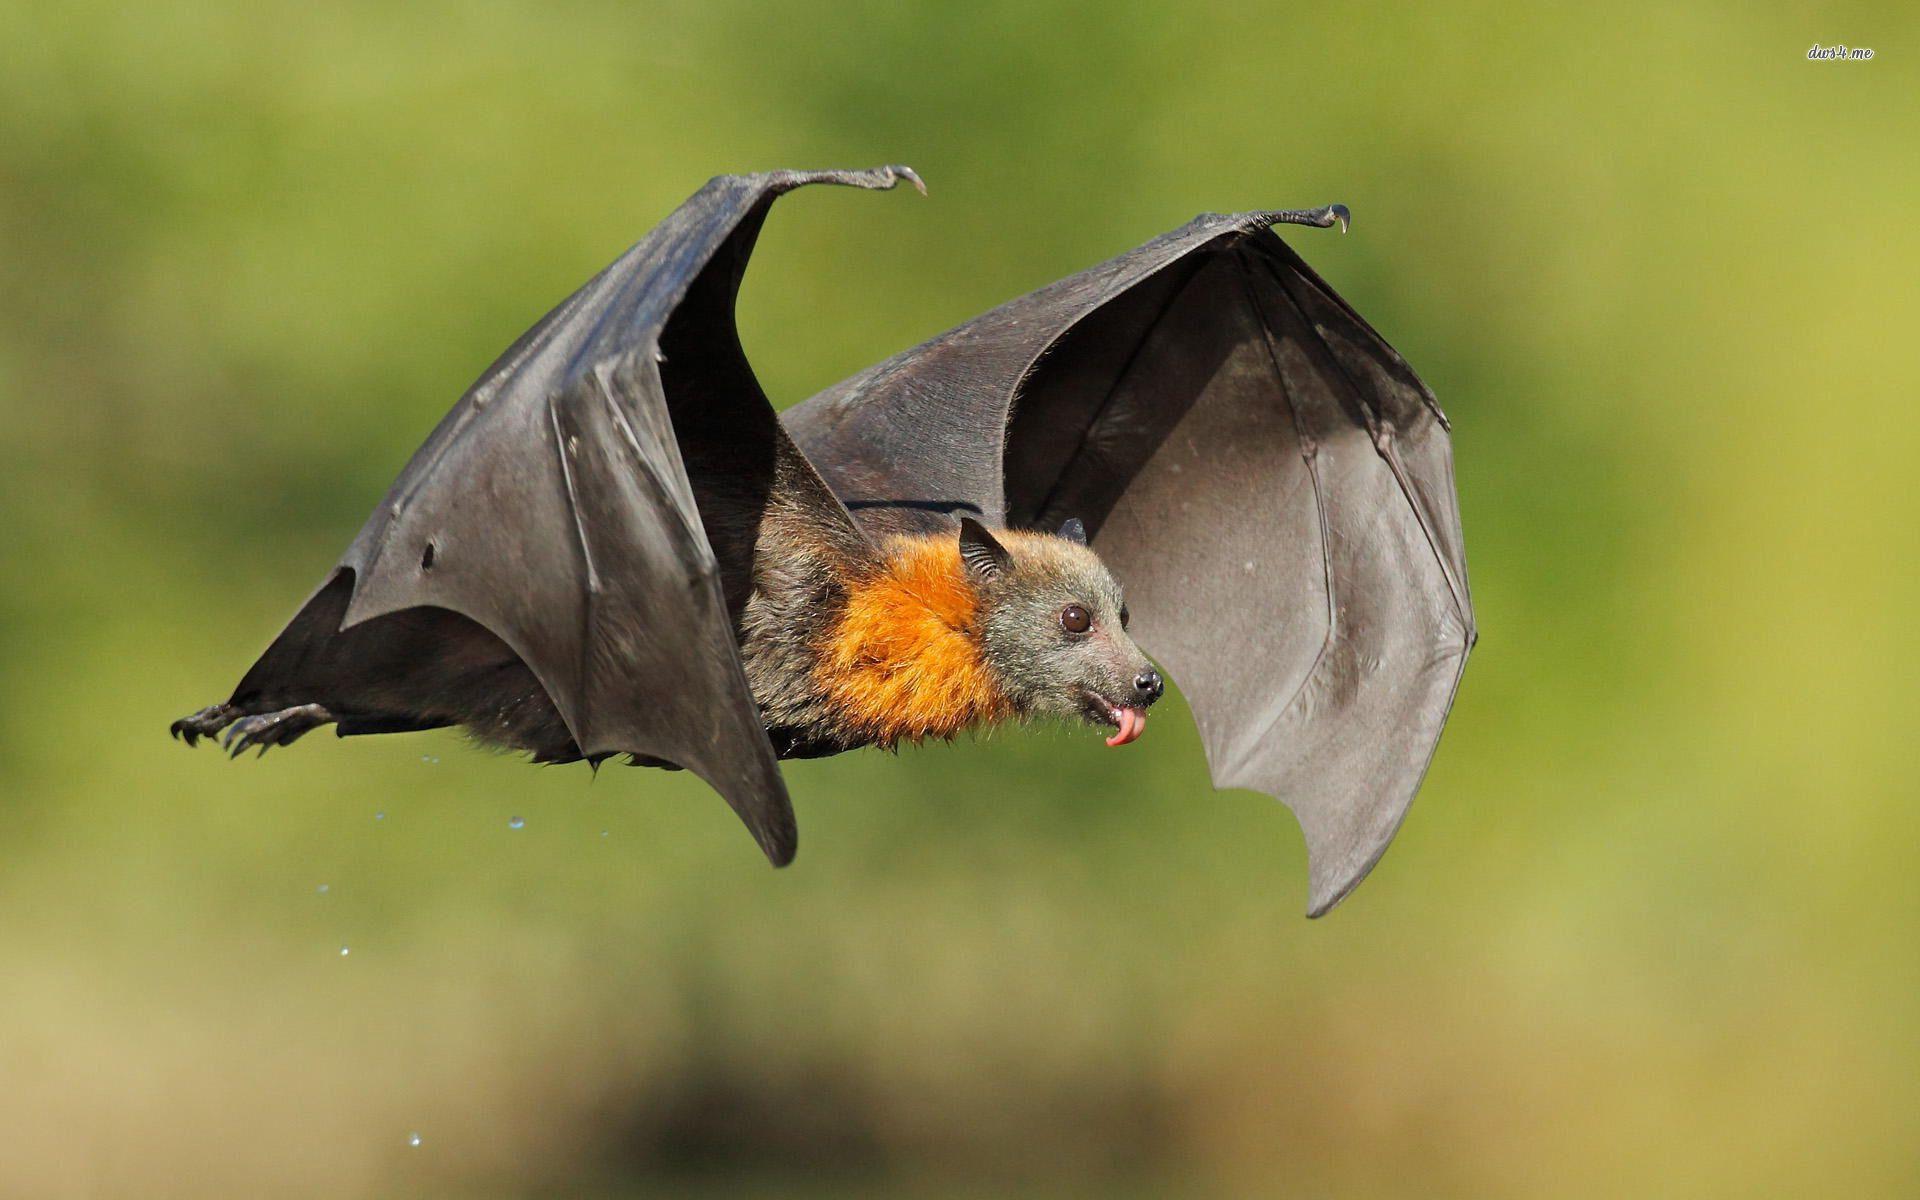 Cute Bat Hd Wallpaper Cute Bat Amazing Animal Pictures Animals